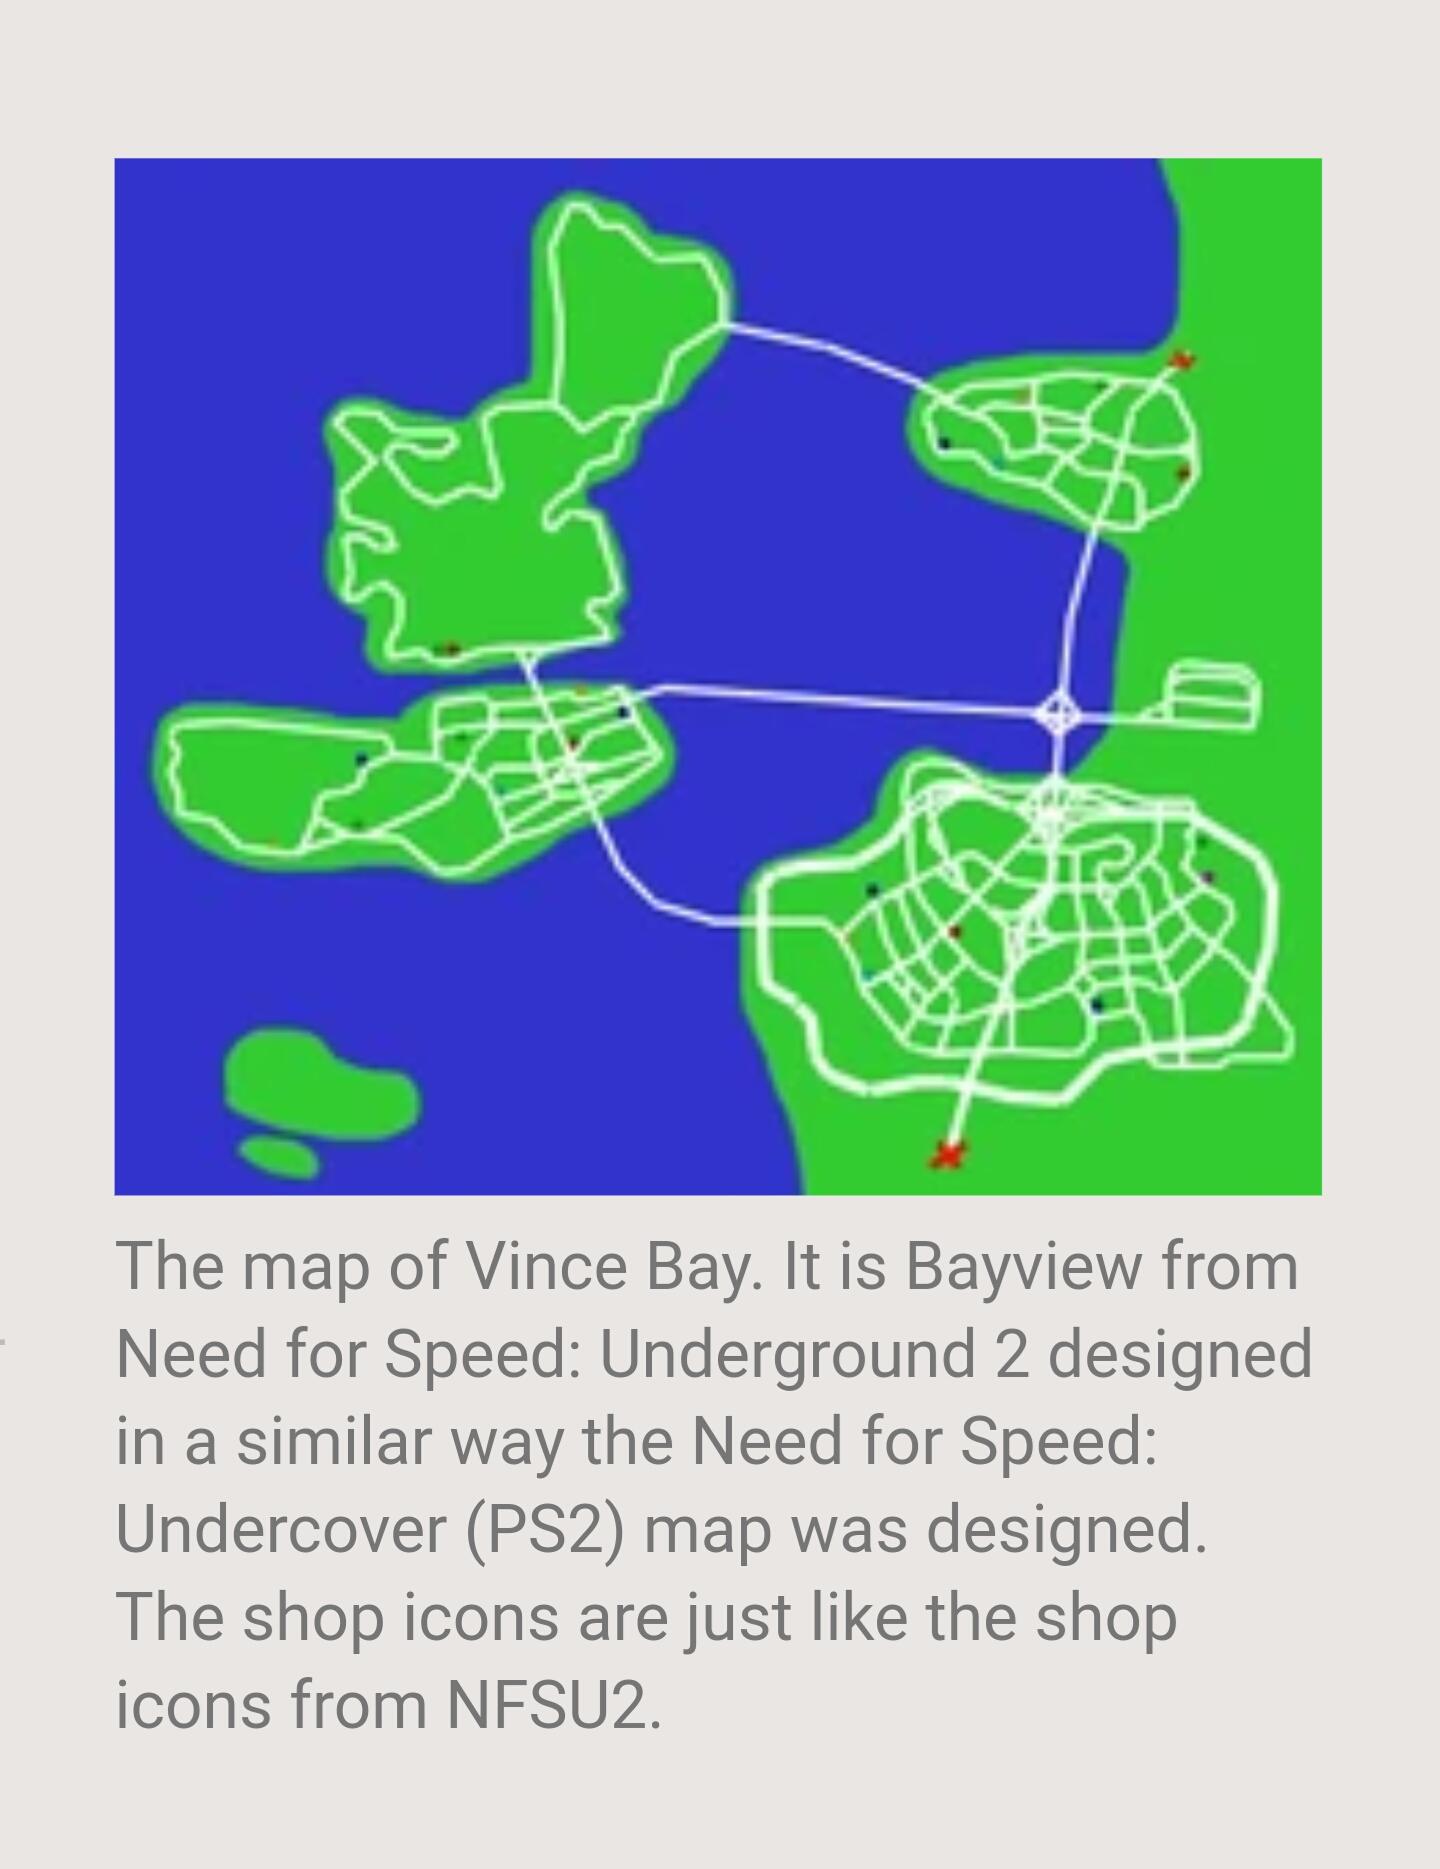 Need For Speed Underground 2 Map : speed, underground, Discovered, Cursed, Discord, Server, GoAnimateV2, Needforspeed